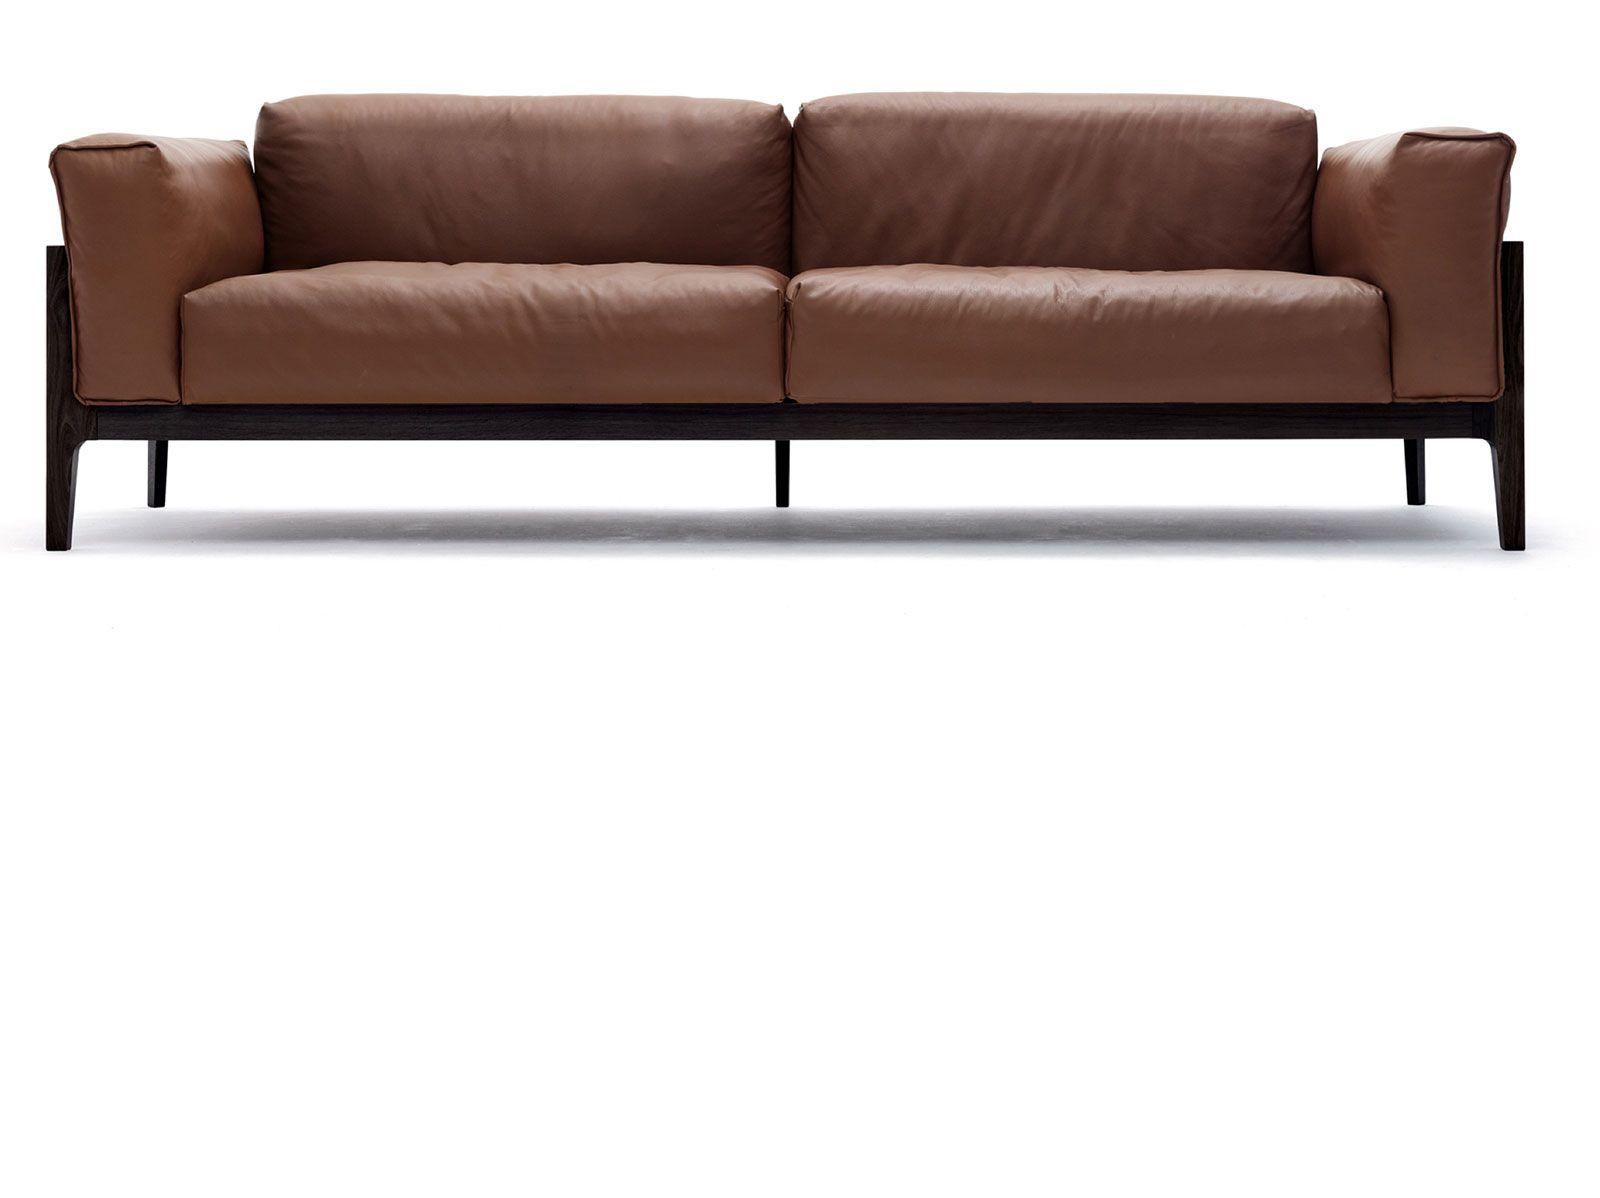 Elm Sofa: Cor | Ff.sofa In 2018 | Pinterest | Sofa, Sofa Furniture Within Elm Sofa Chairs (Photo 4 of 25)